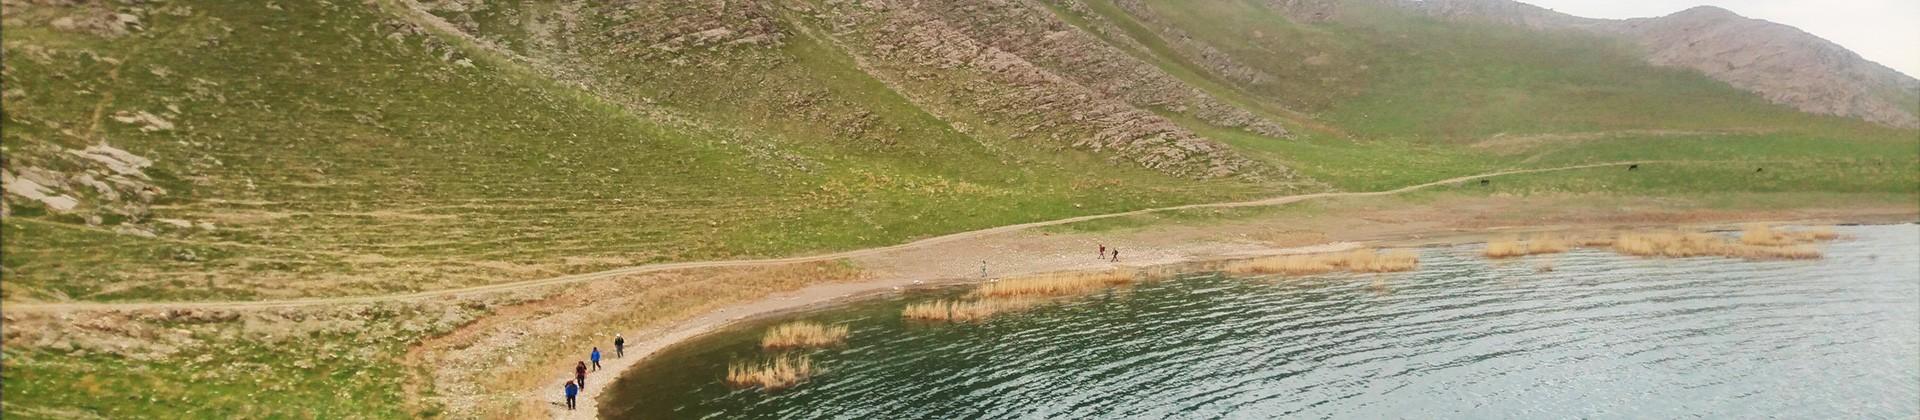 Tour to Aydarkul Lake from Bukhara with return to Bukhara - 1